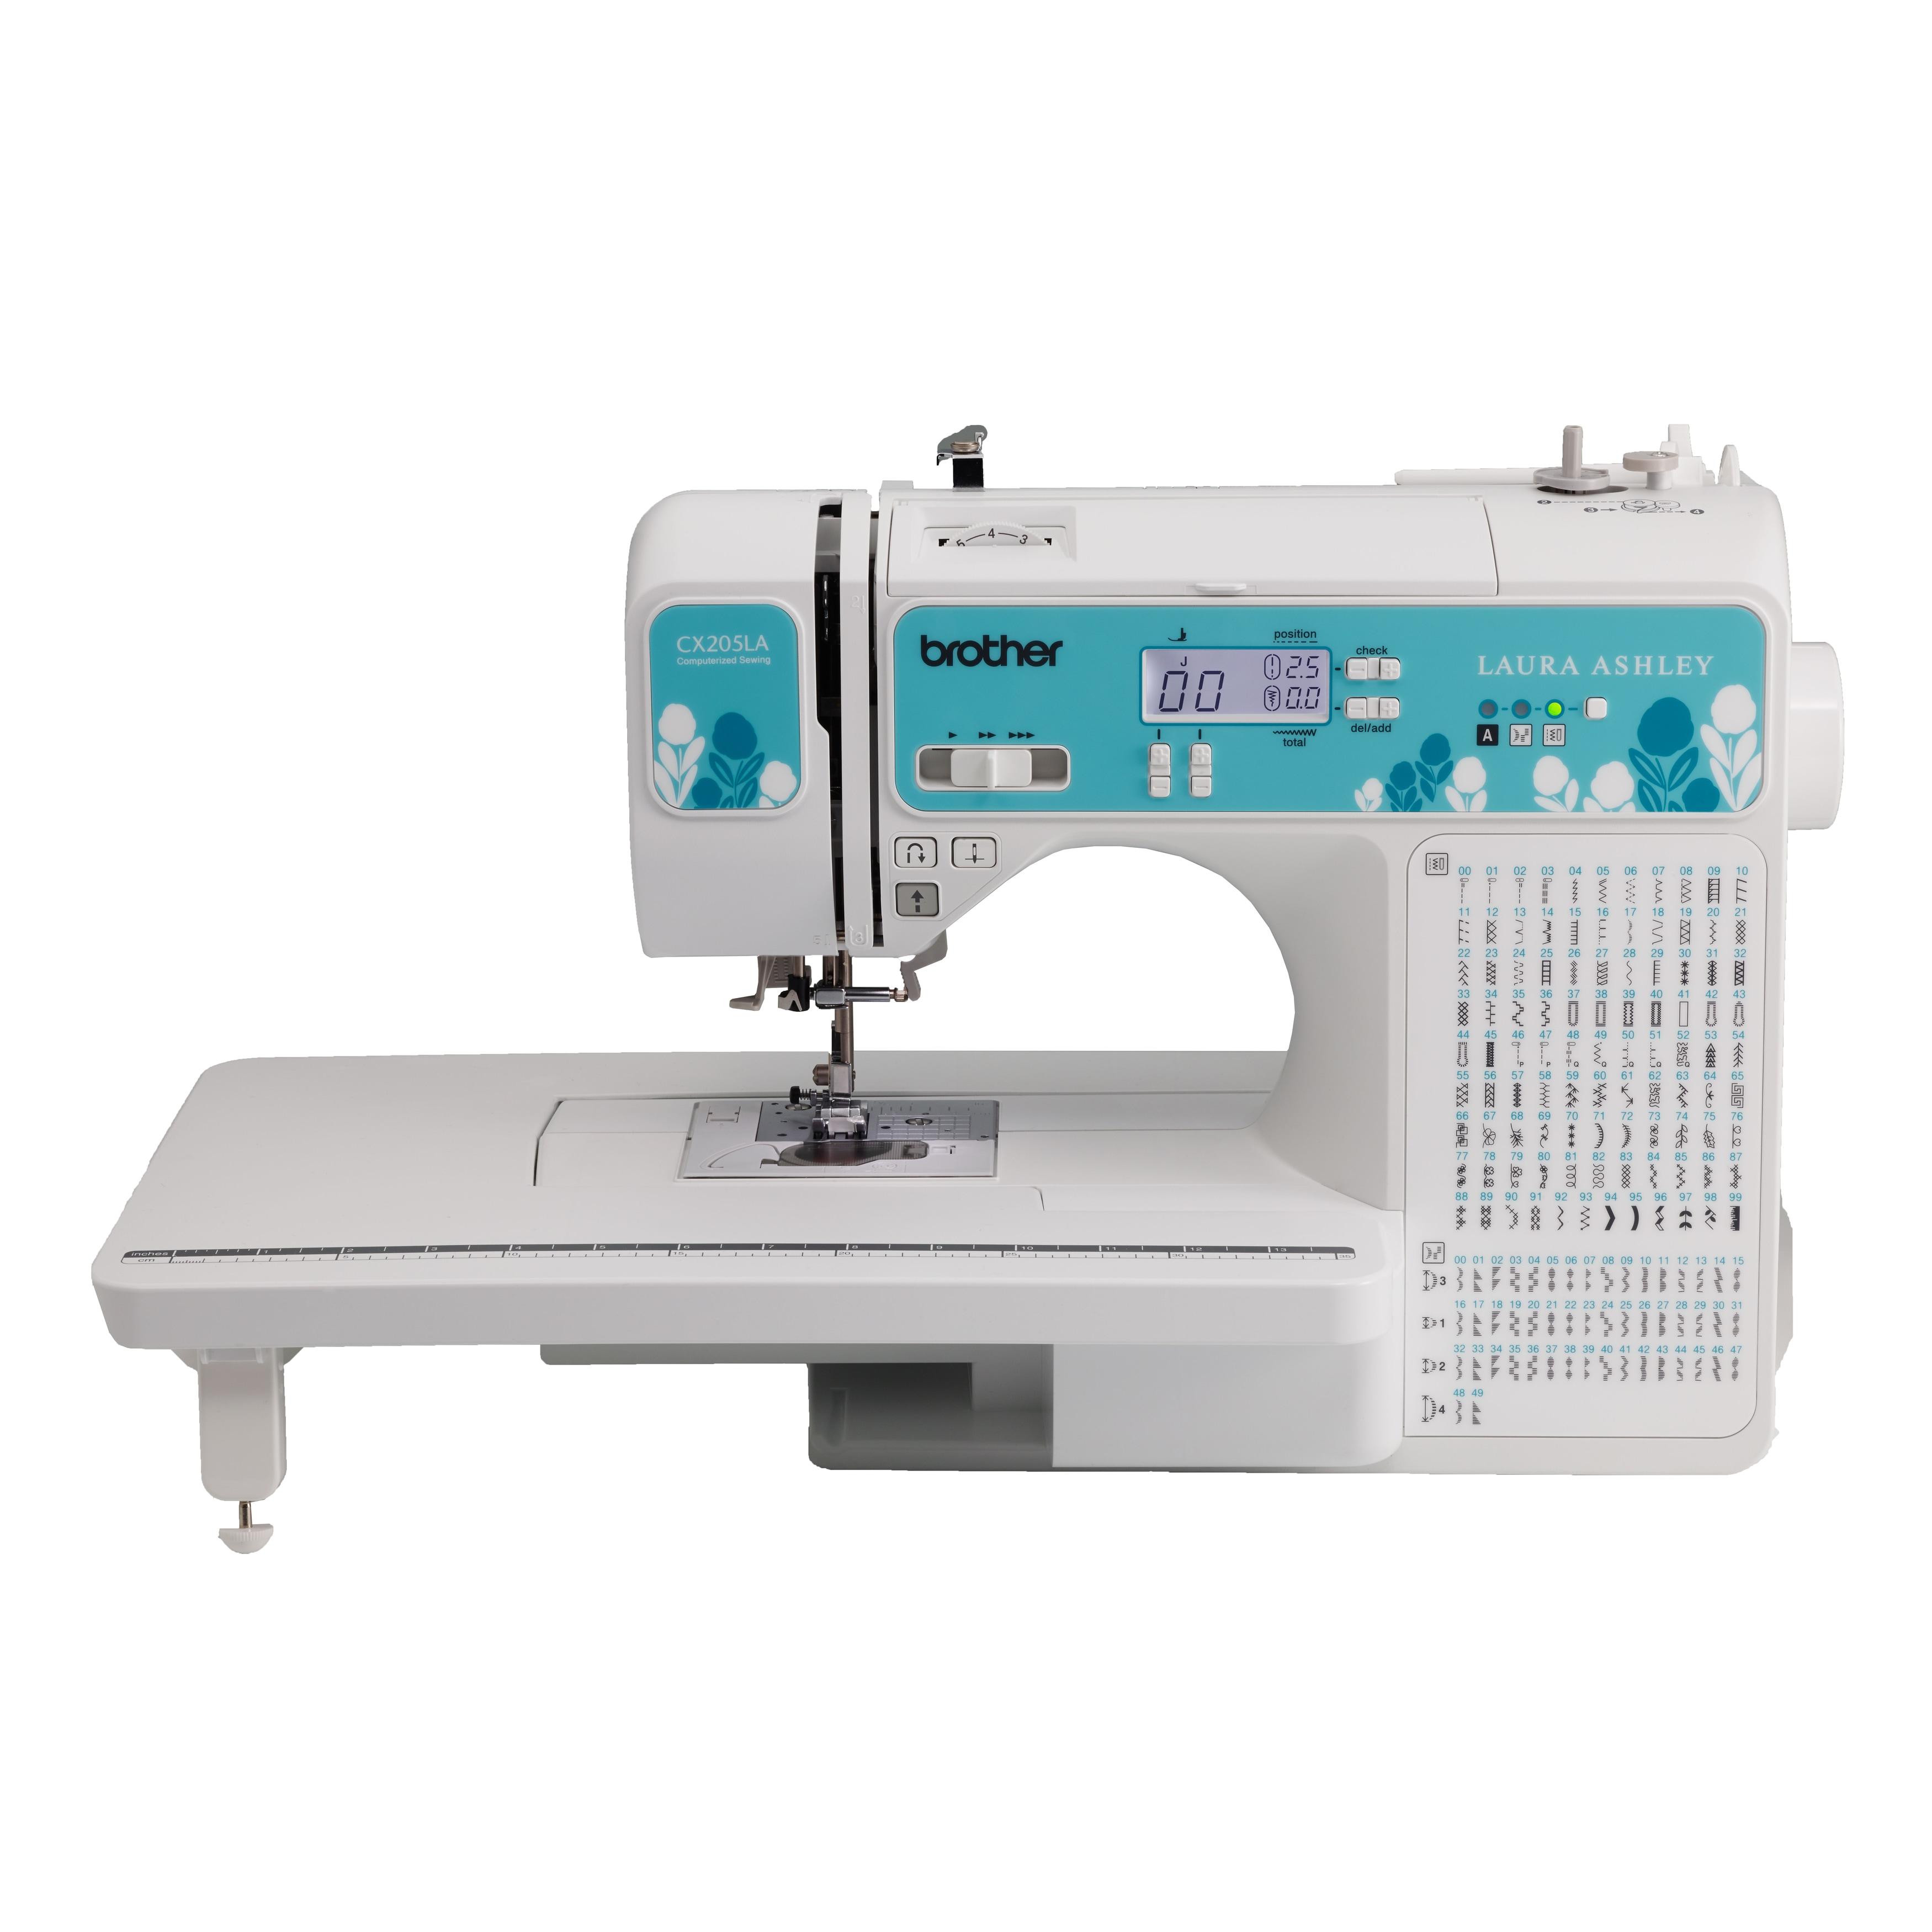 Brother CX205LA Laura Ashley Computerized Sewing Machine,...